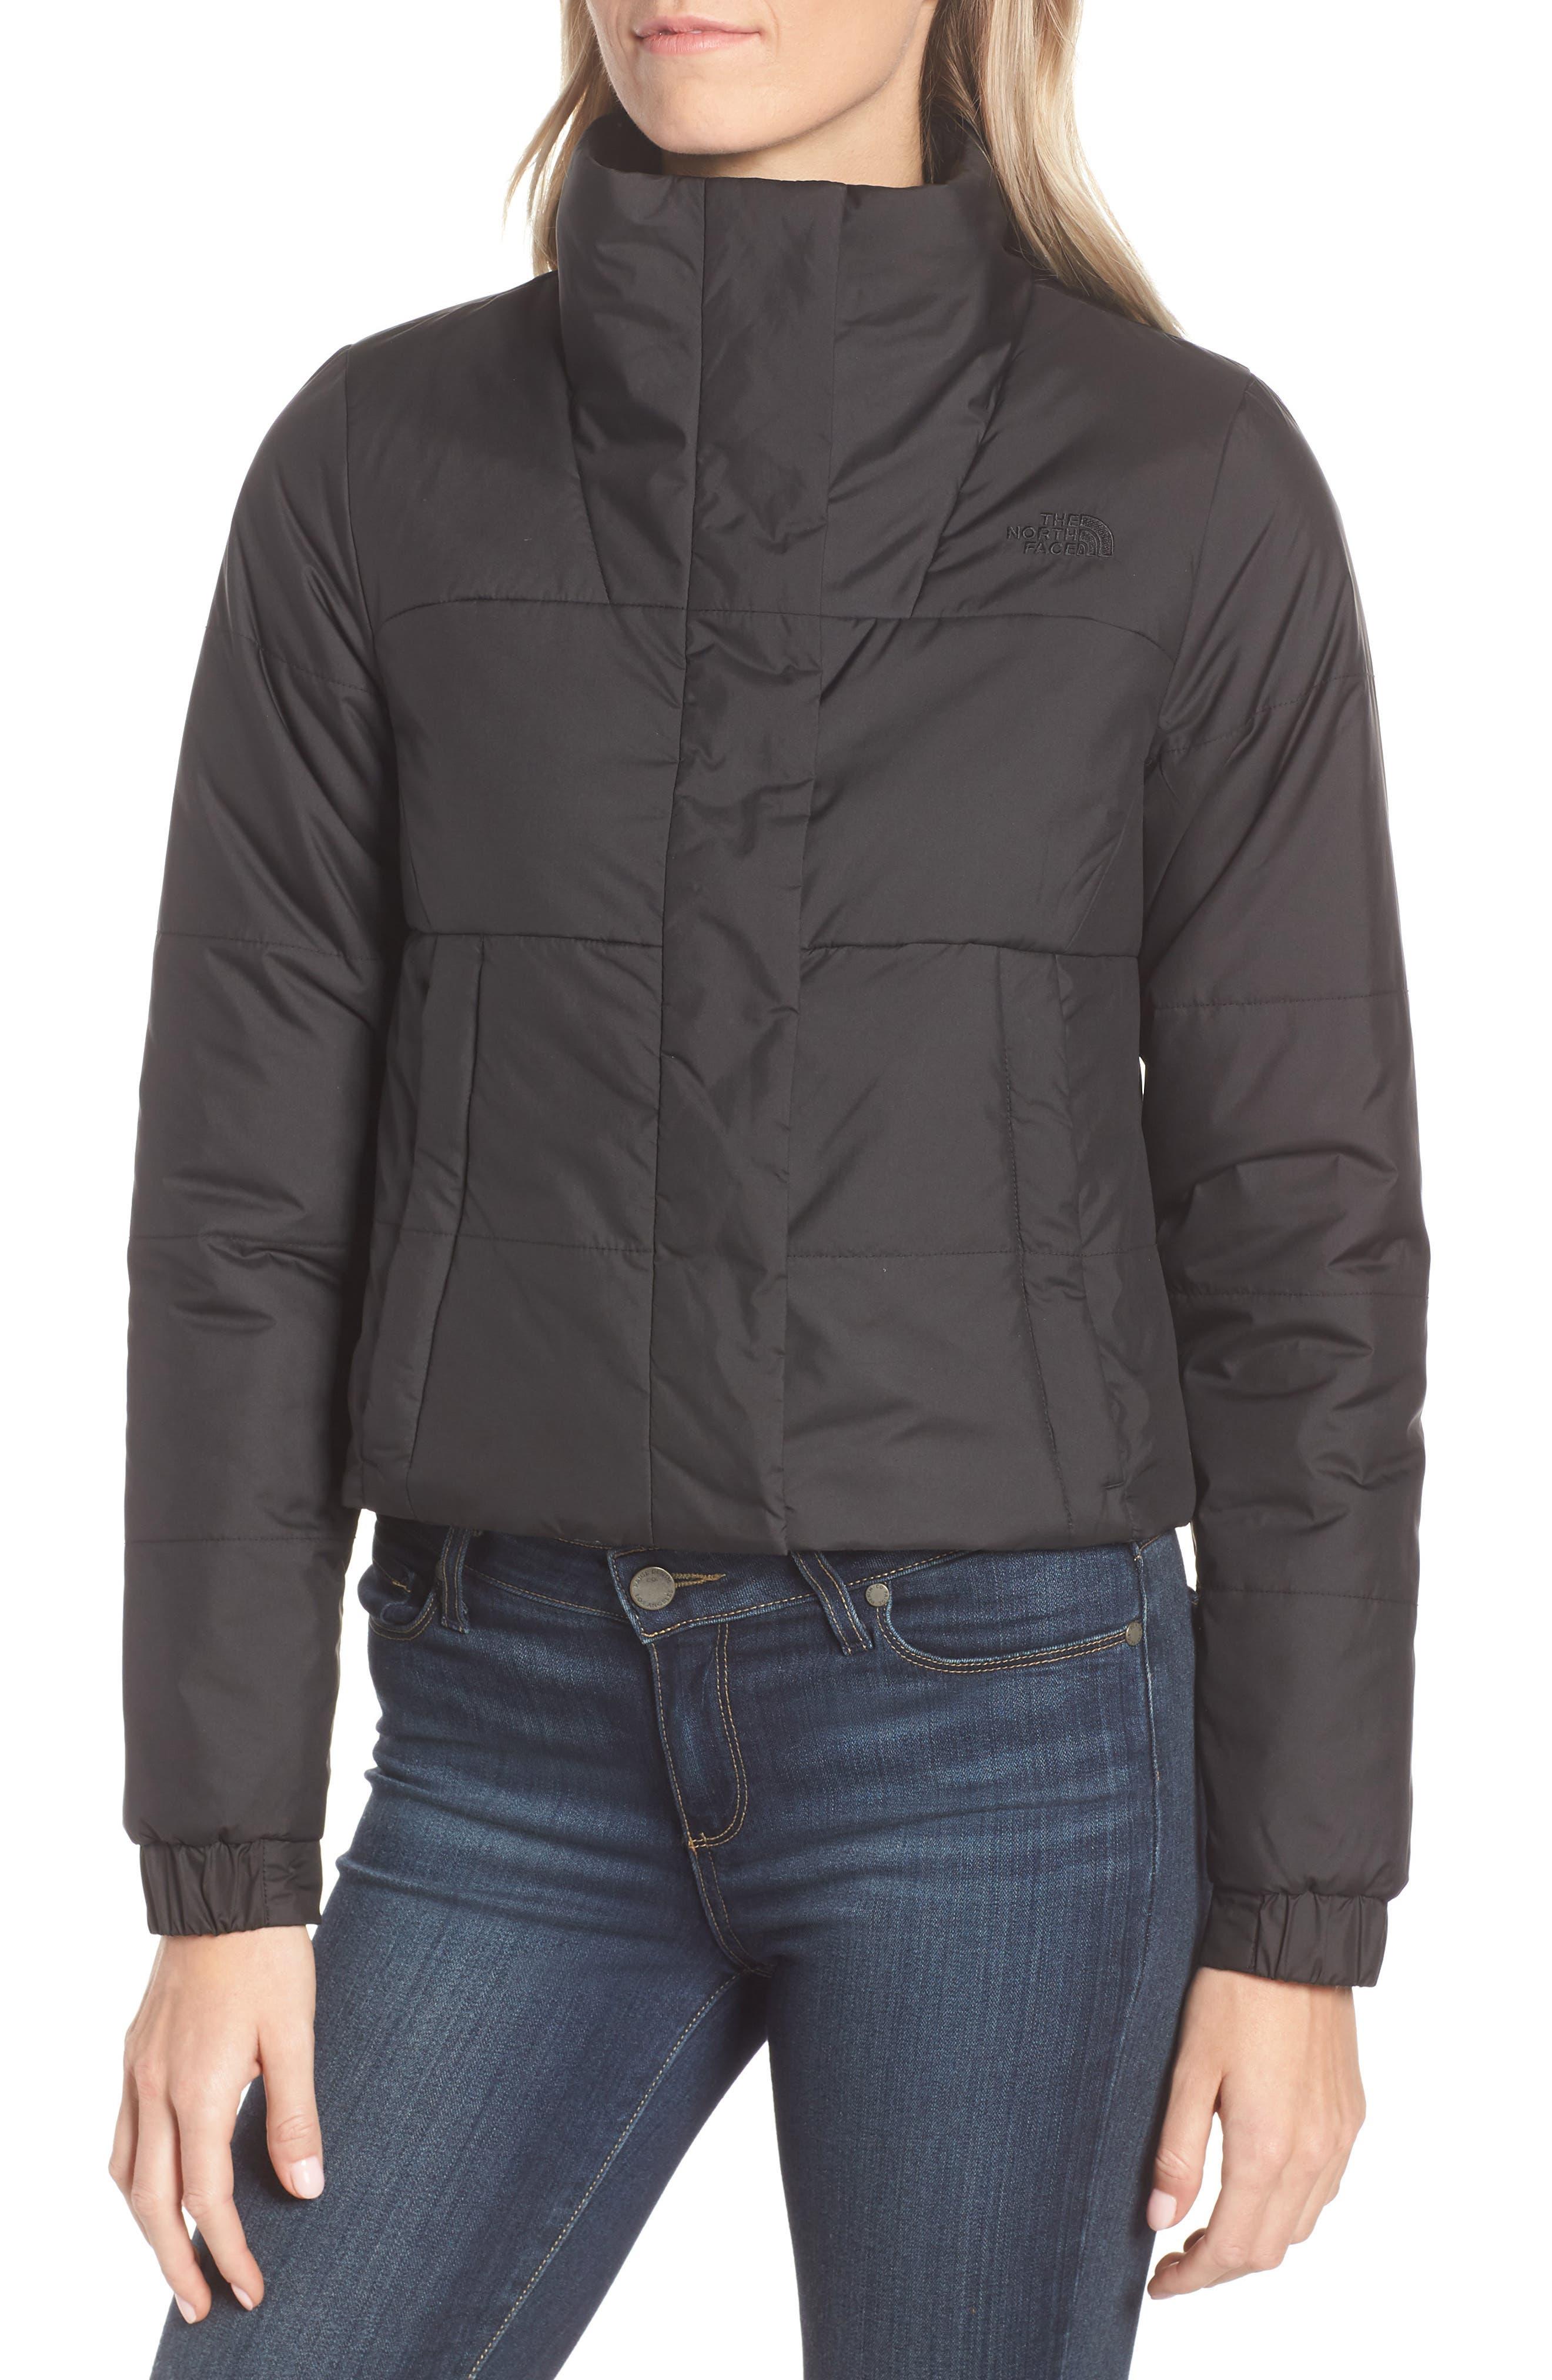 THE NORTH FACE, Femtastic Heatseeker Insulated Jacket, Alternate thumbnail 5, color, TNF BLACK